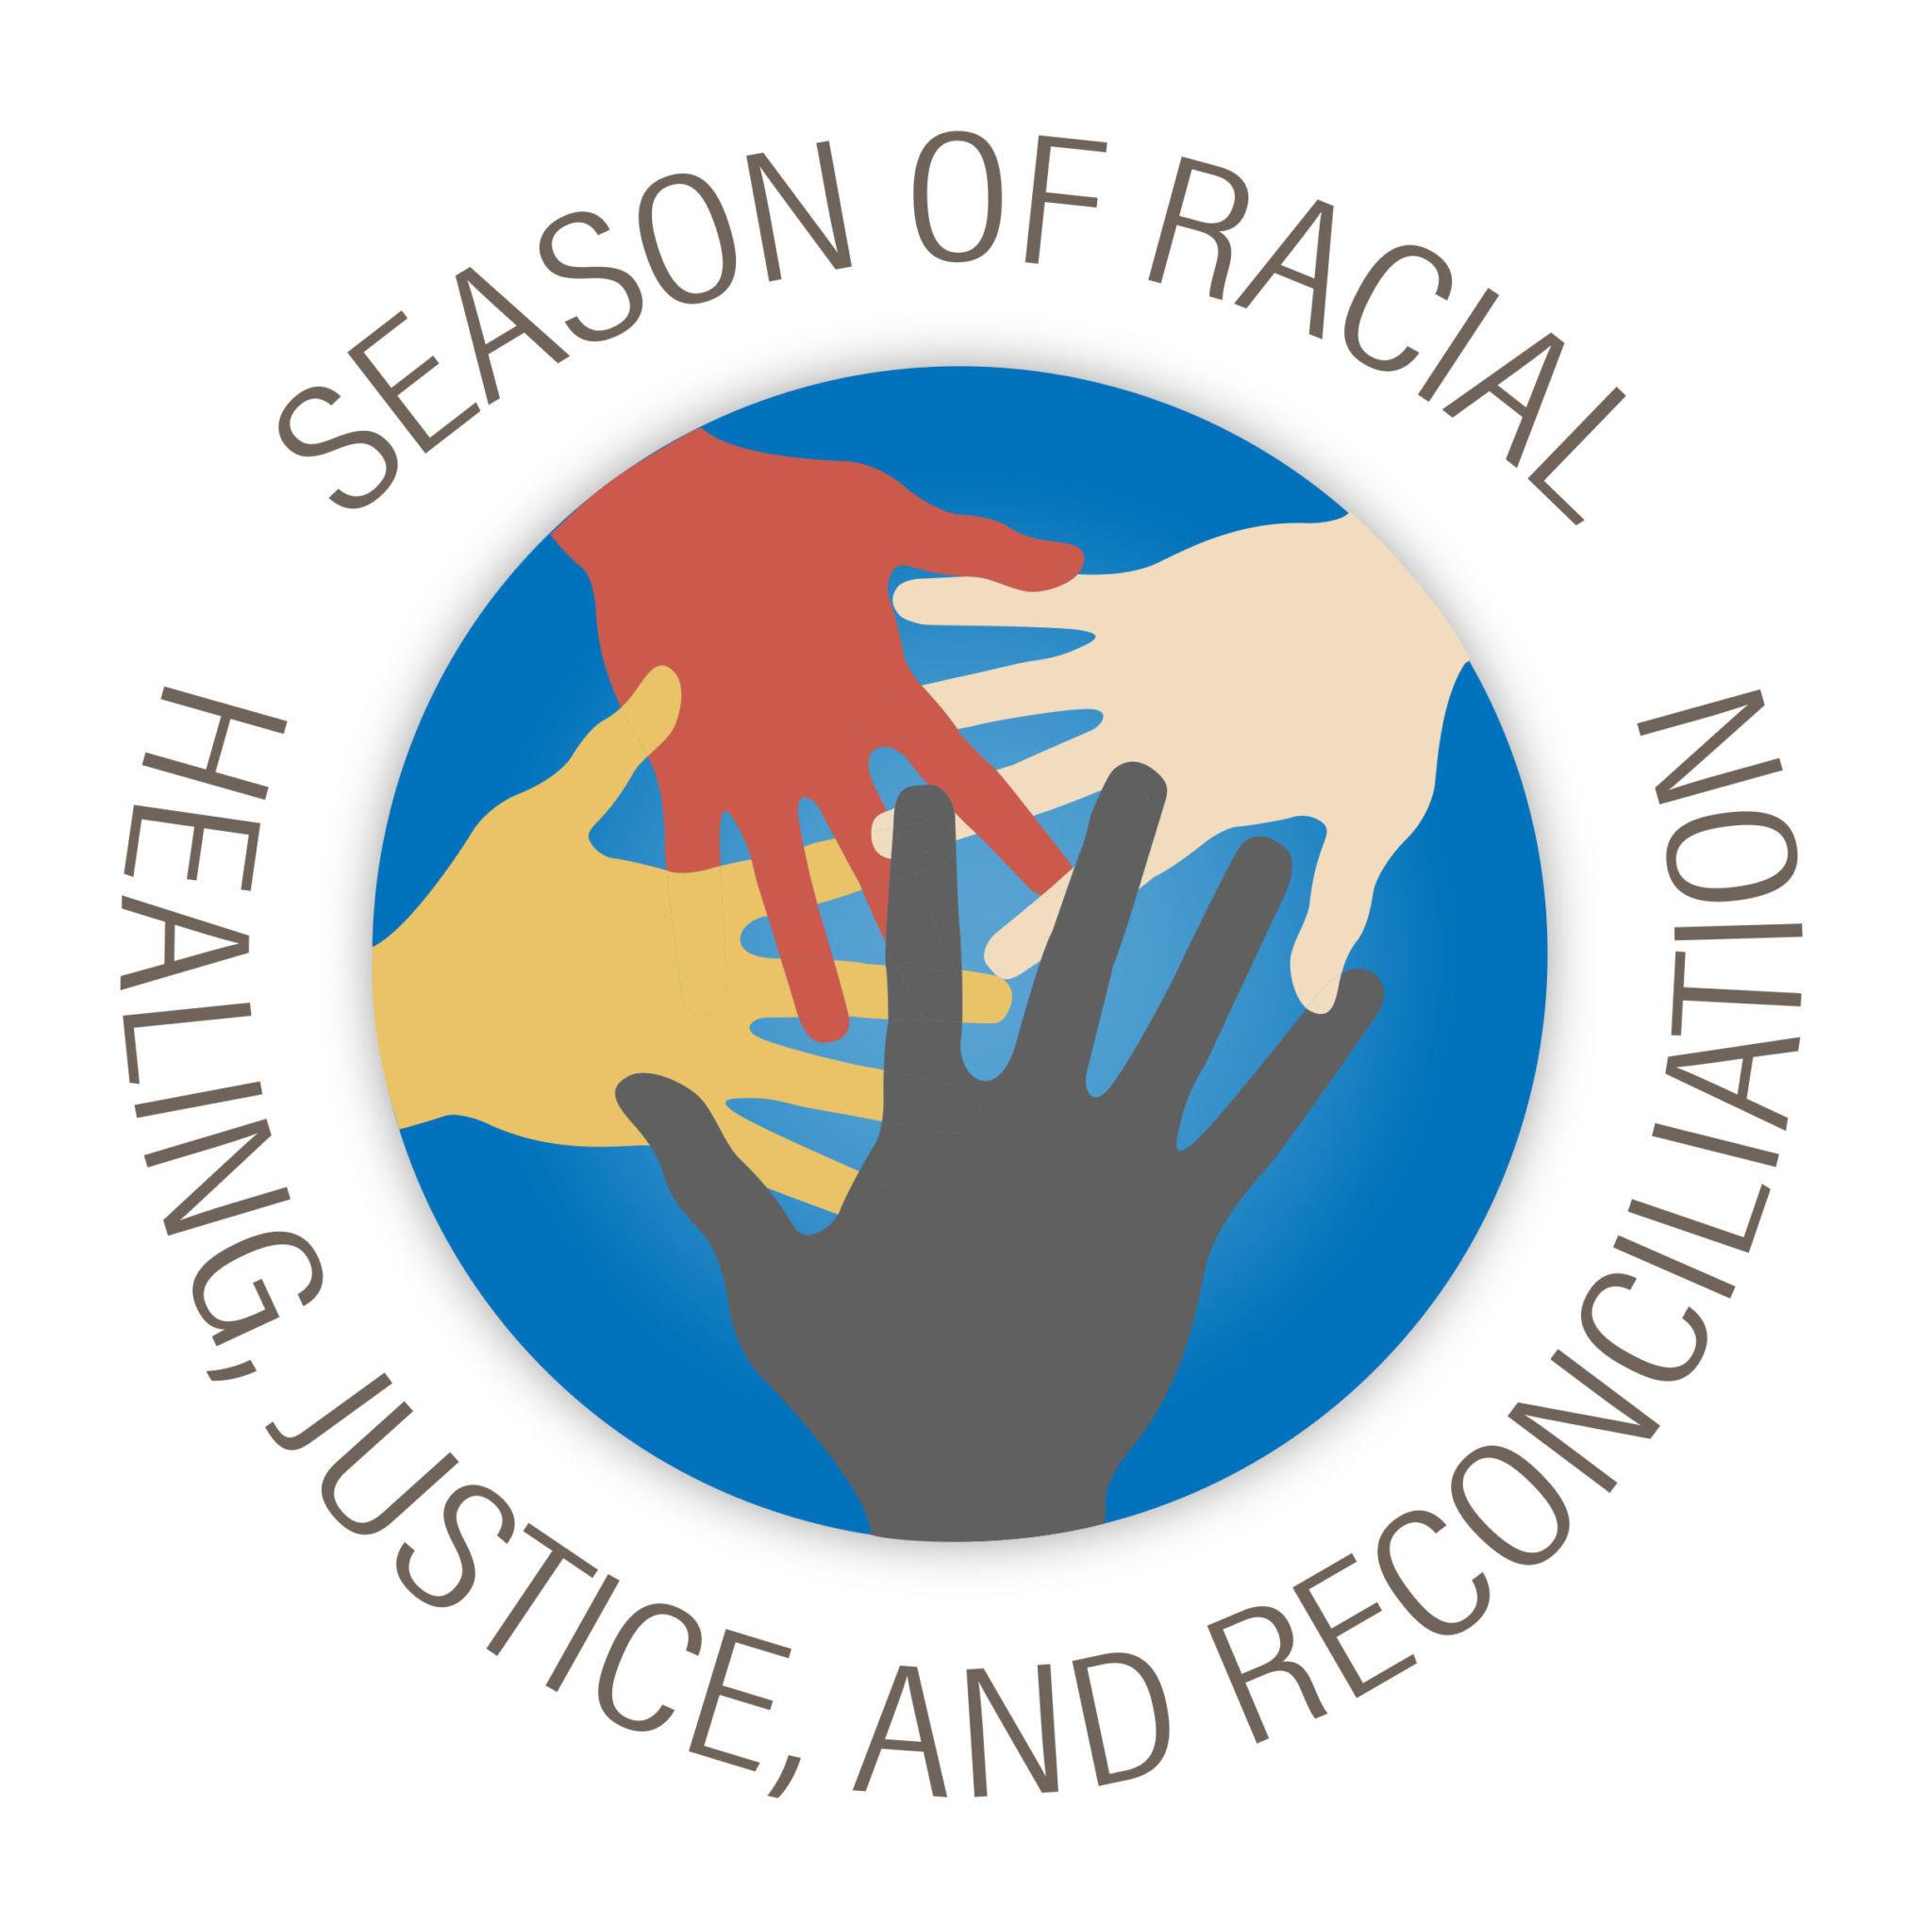 Gathering- ECCT Racial Reconciliation Network